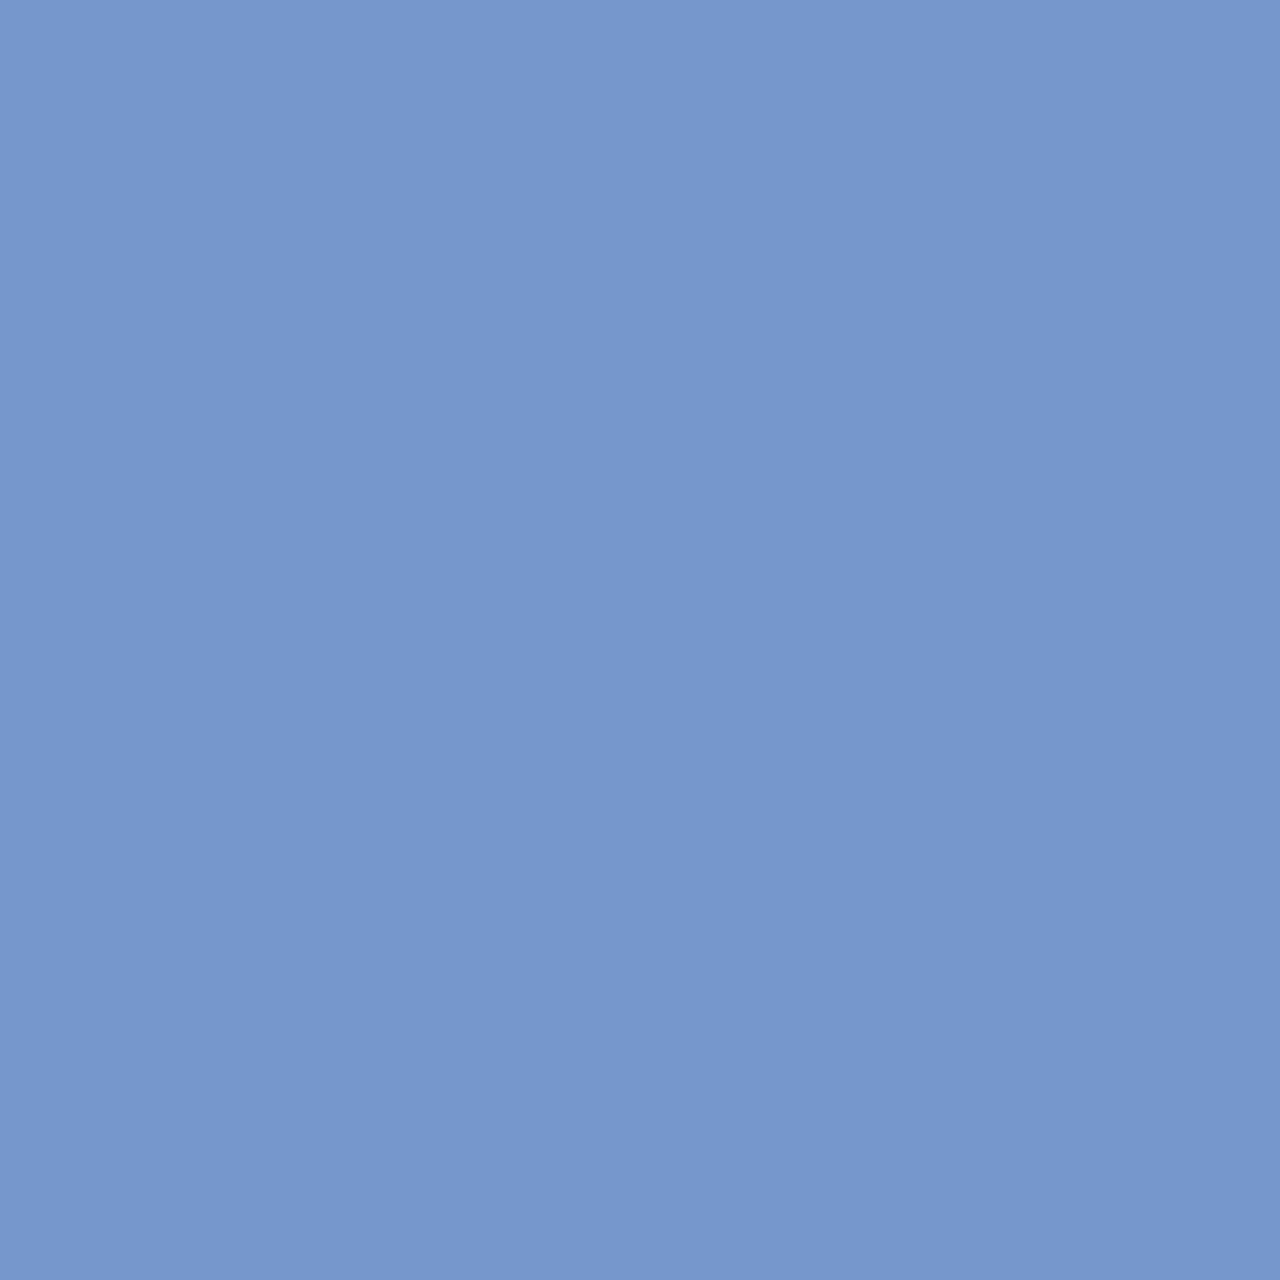 "#3202 Rosco 1/1Full Blue CTB Color Conversion Filter,20x24"" Gels"